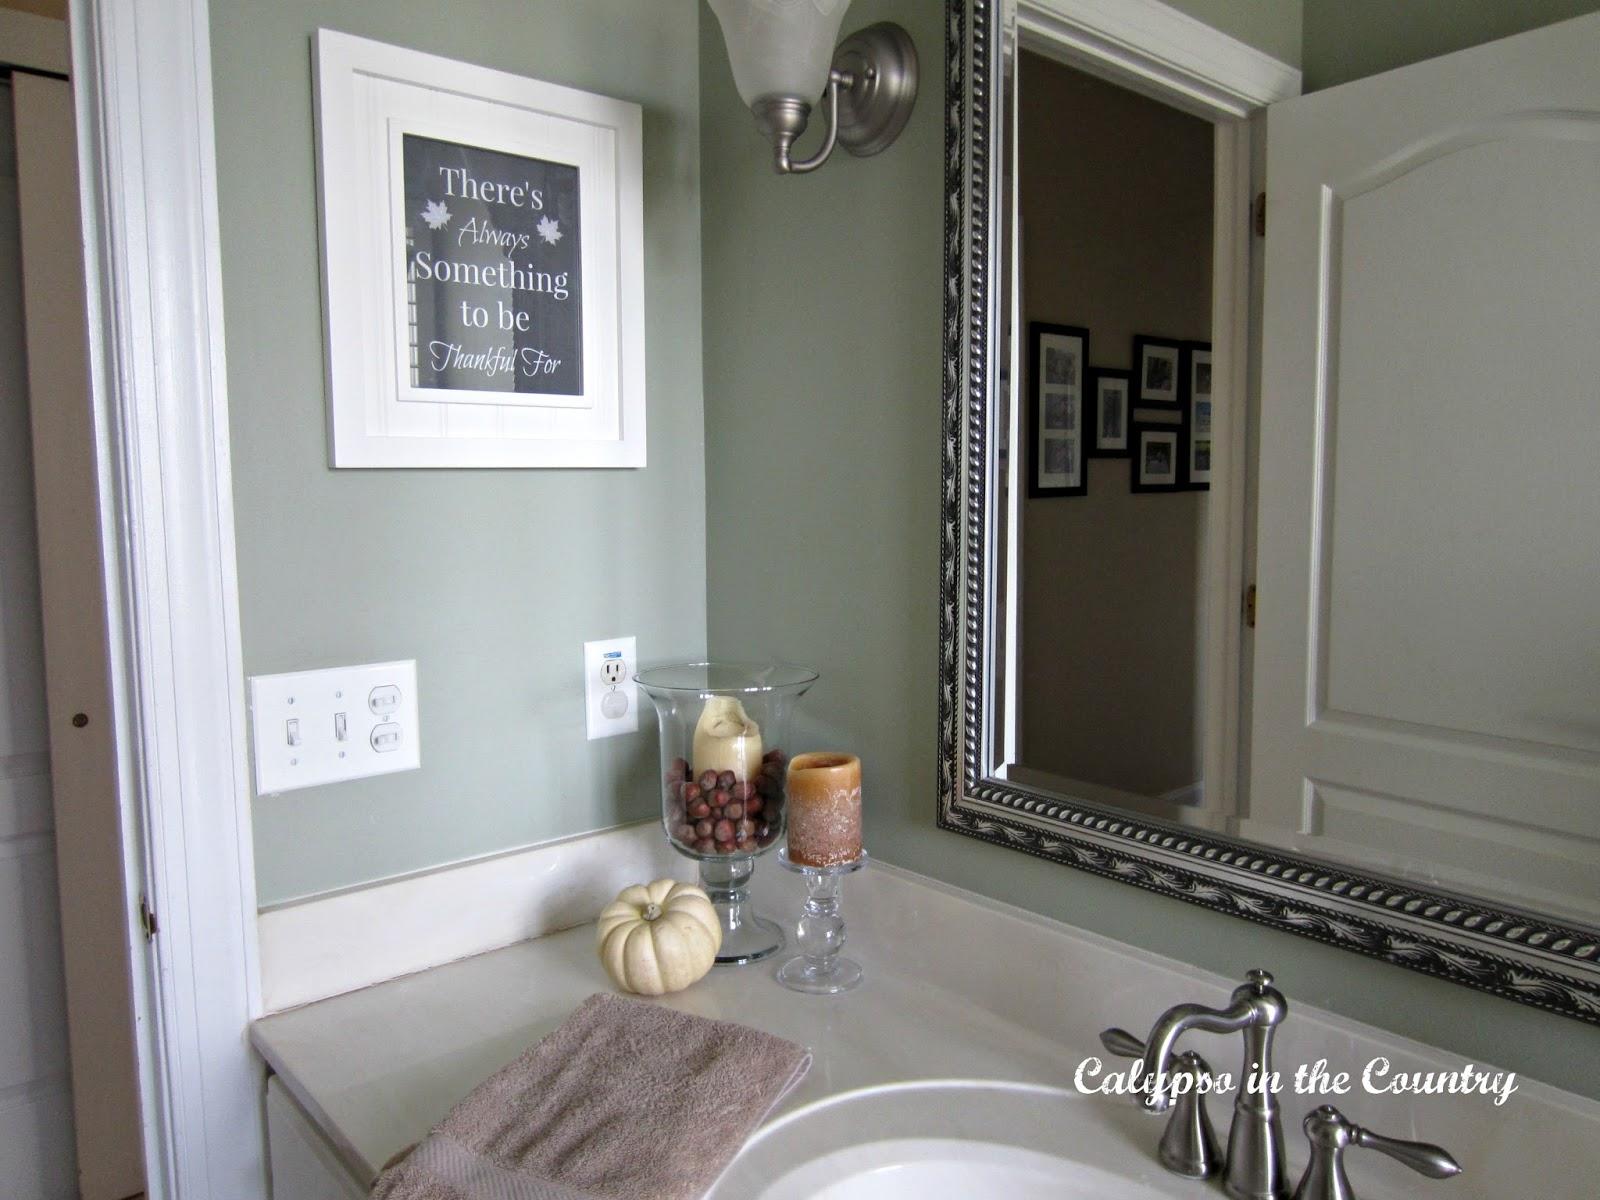 Bathroom Vignette with Thanksgiving art